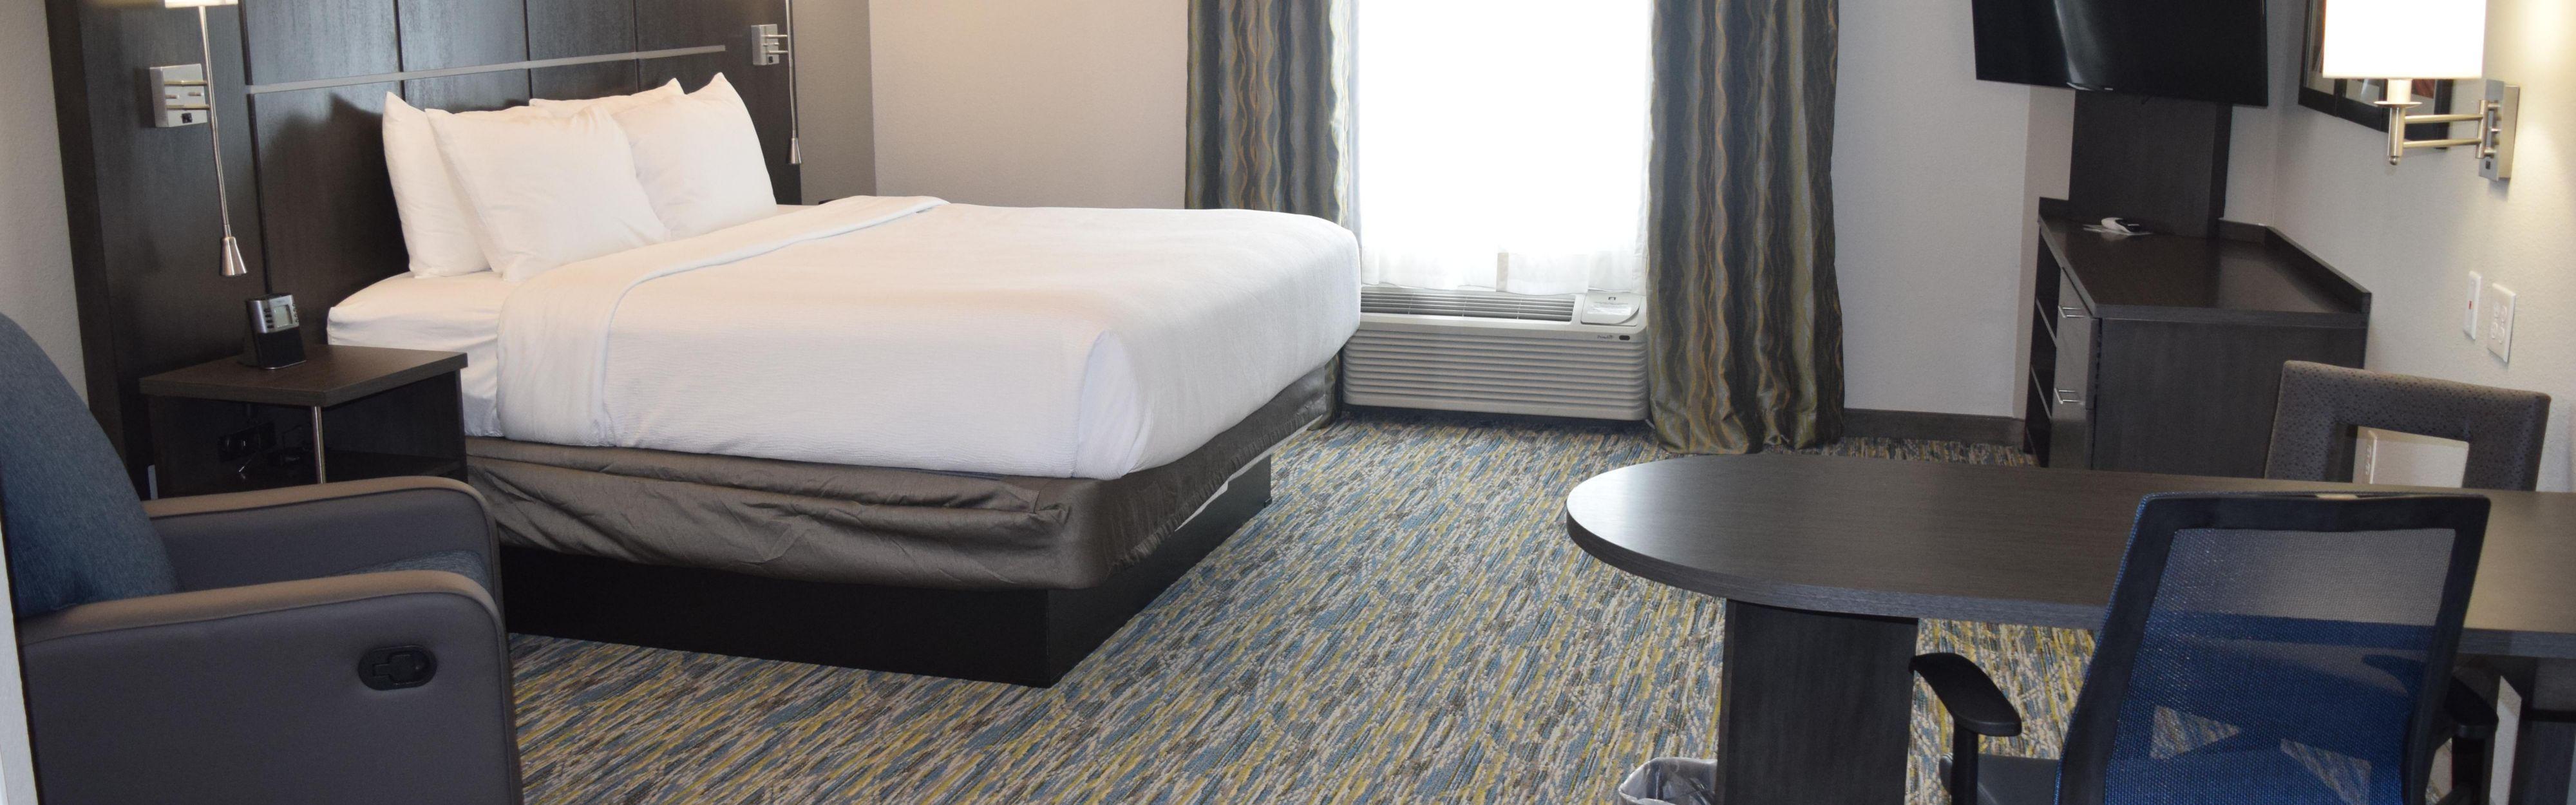 Candlewood Suites Nashville - Metro Center image 1